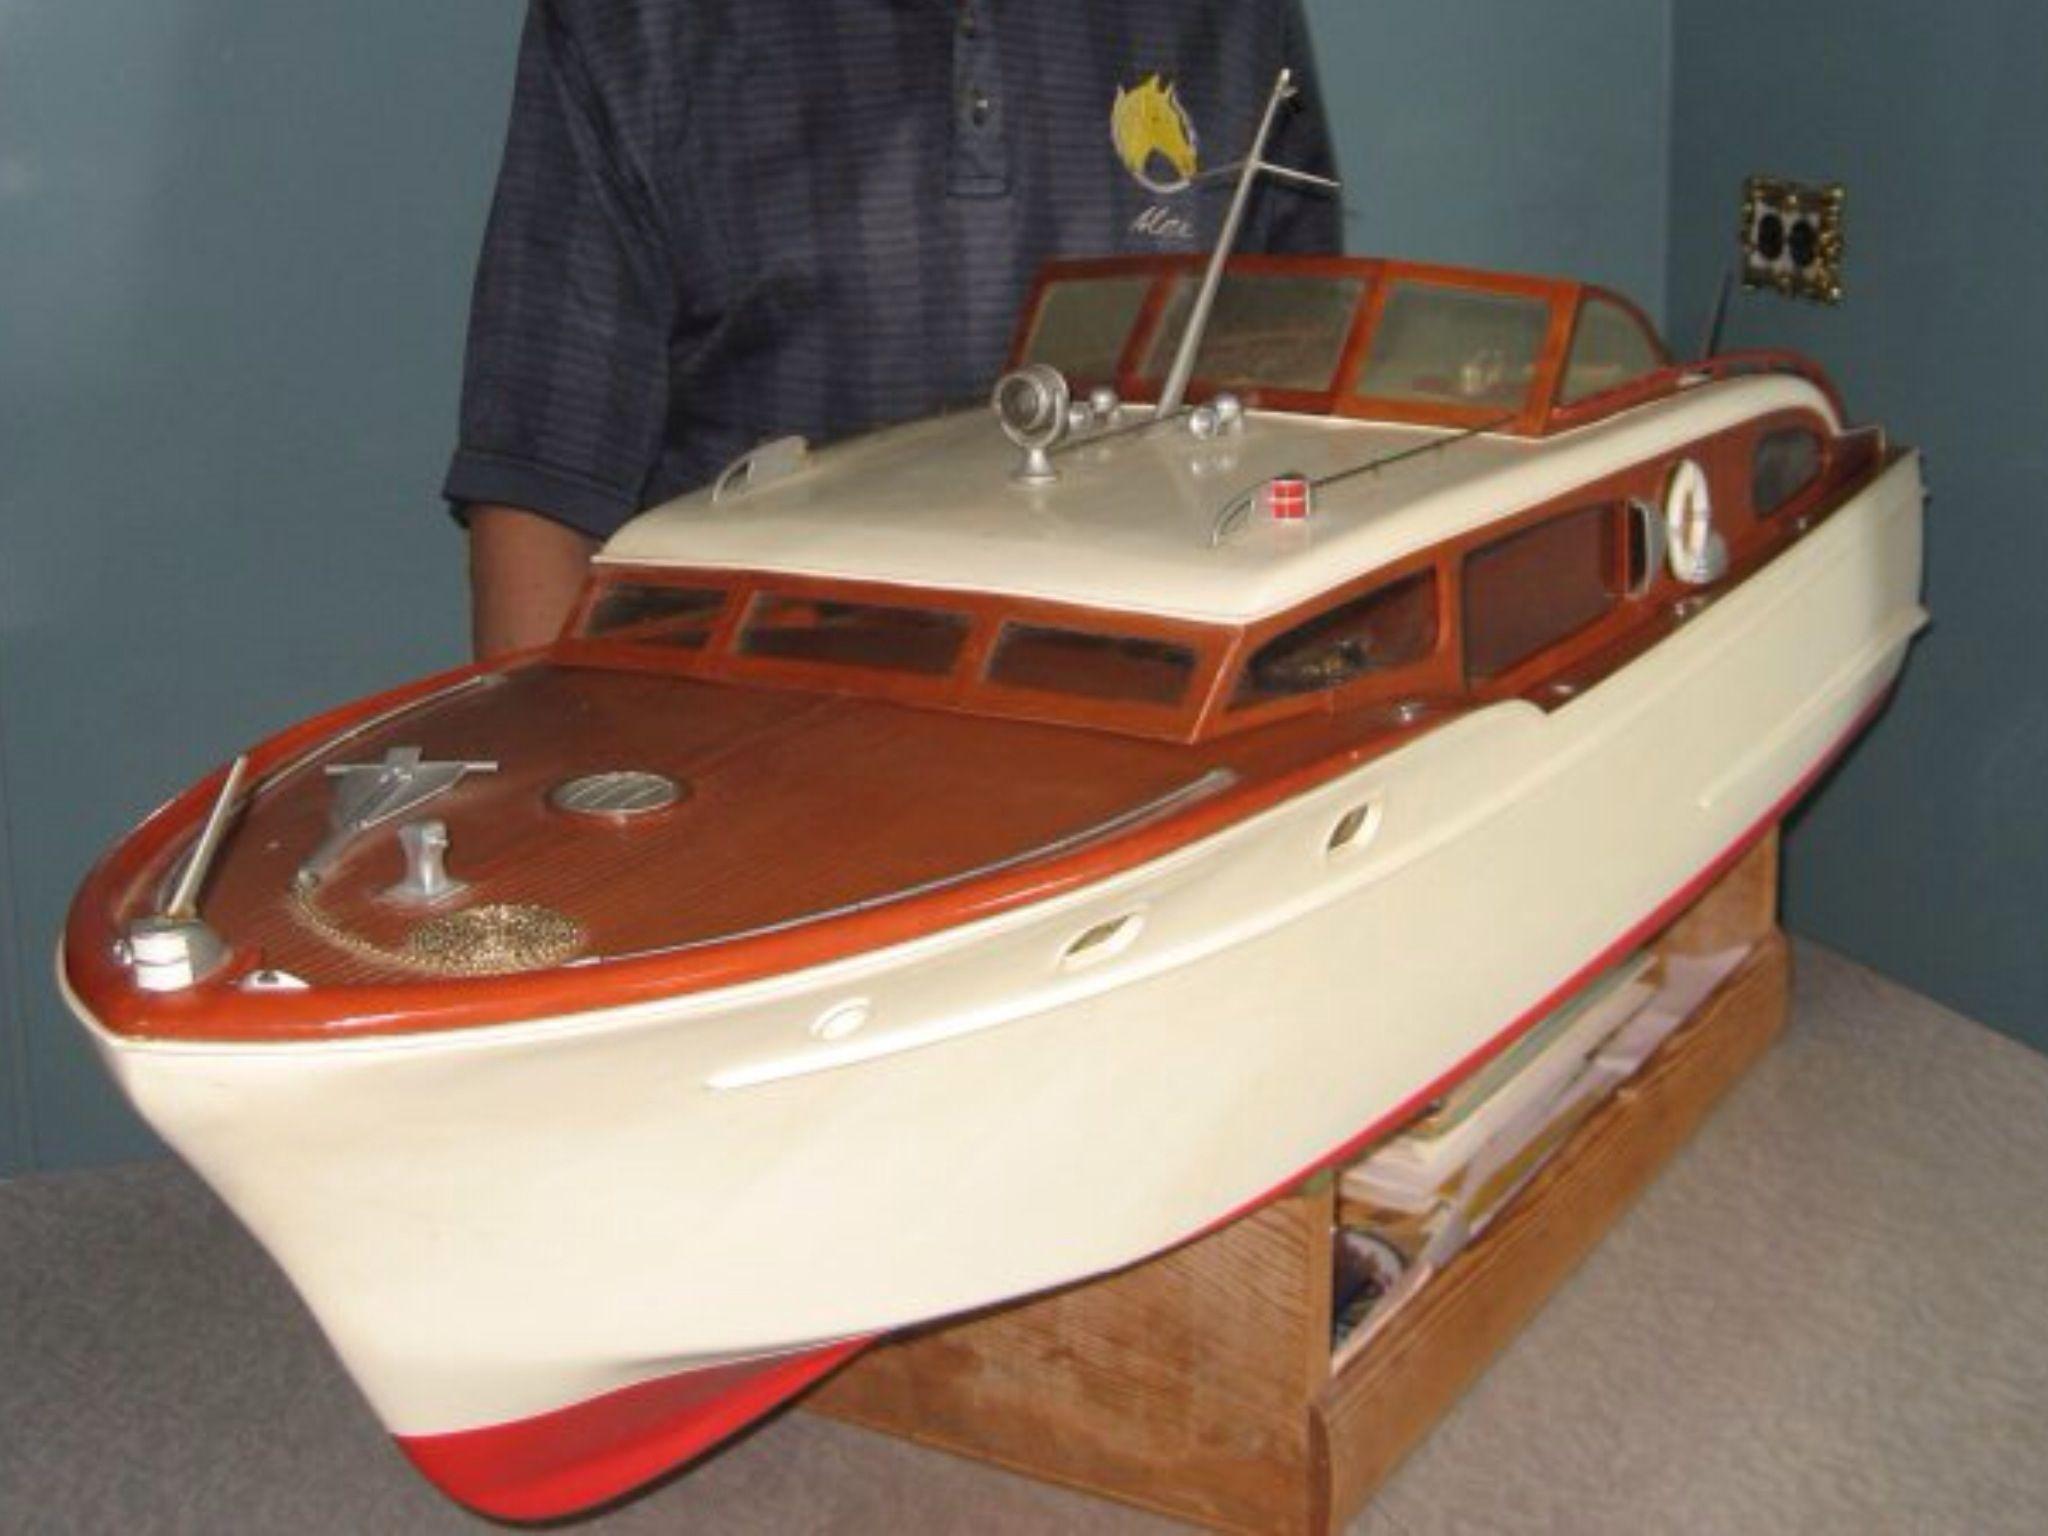 Chris Craft Model Boat | Hobby Stuff I Like | Classic wooden boats, Chris craft boats, Boat